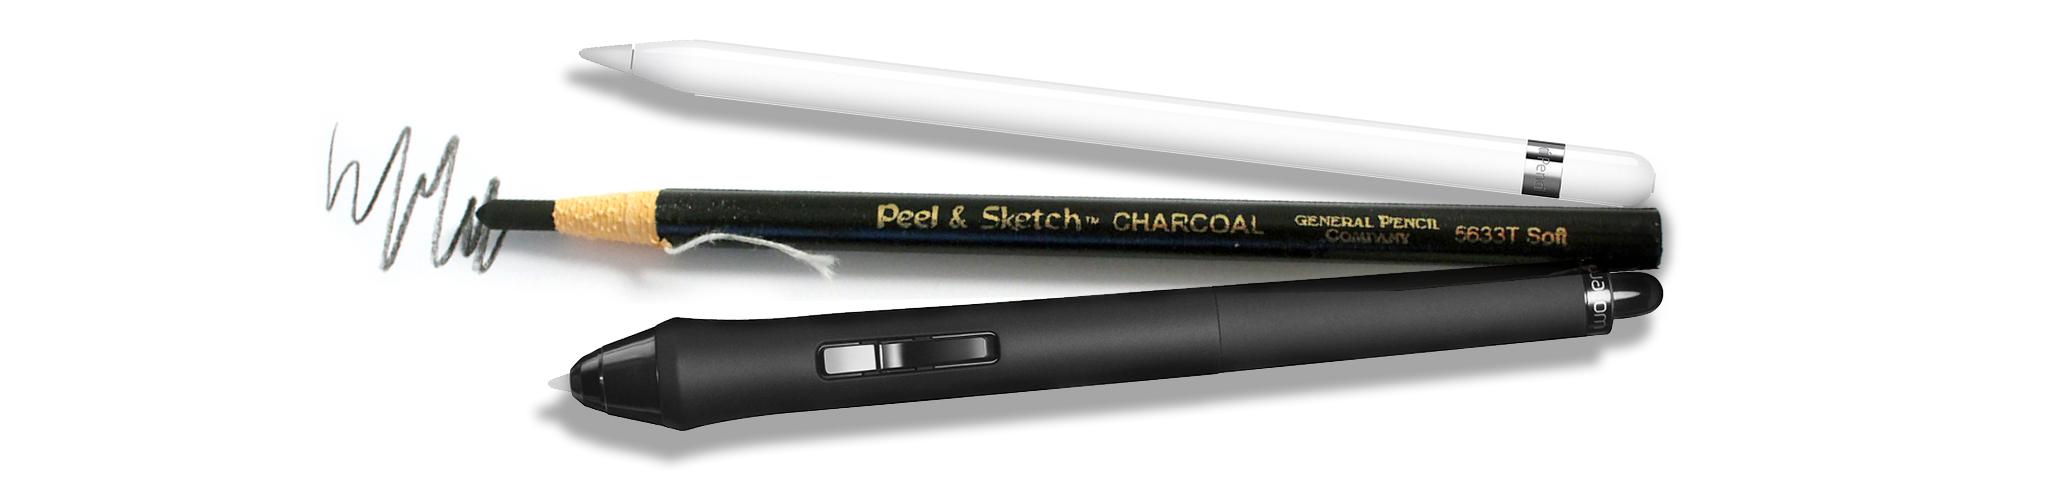 Charcoal_Pencils.jpg